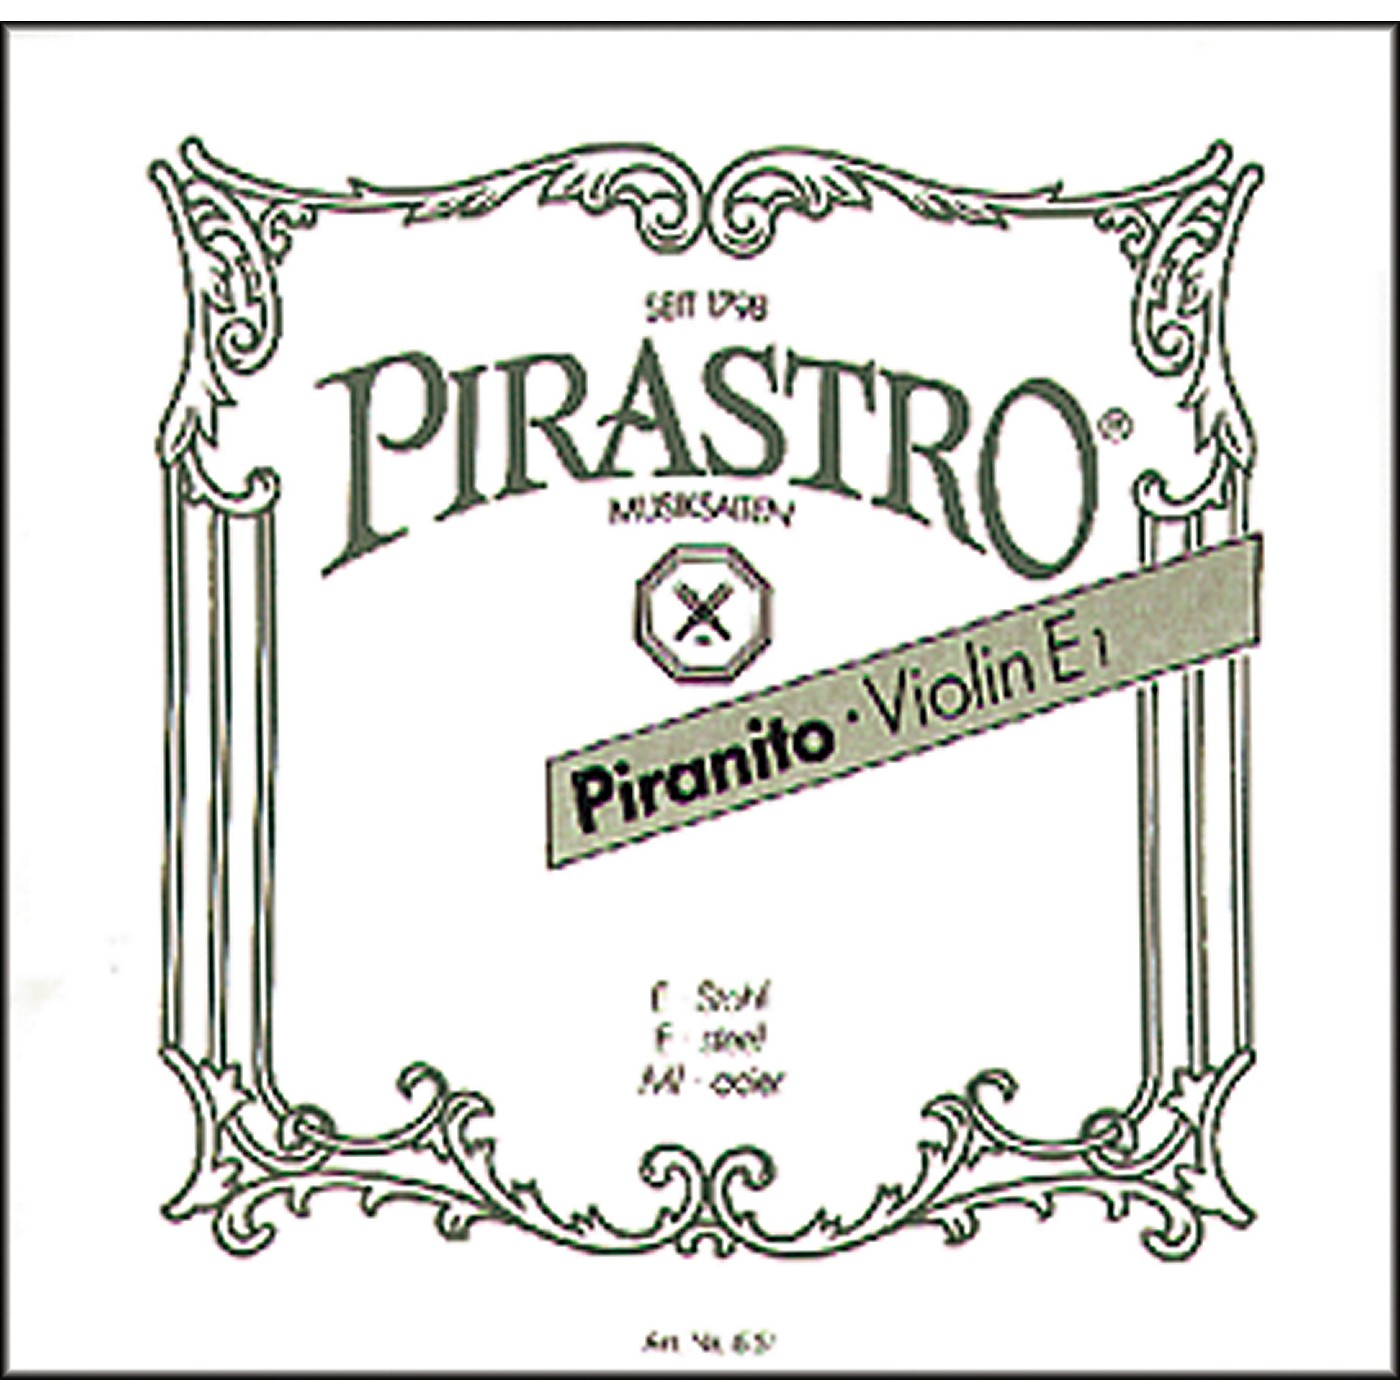 Pirastro Piranito Series Violin D String thumbnail